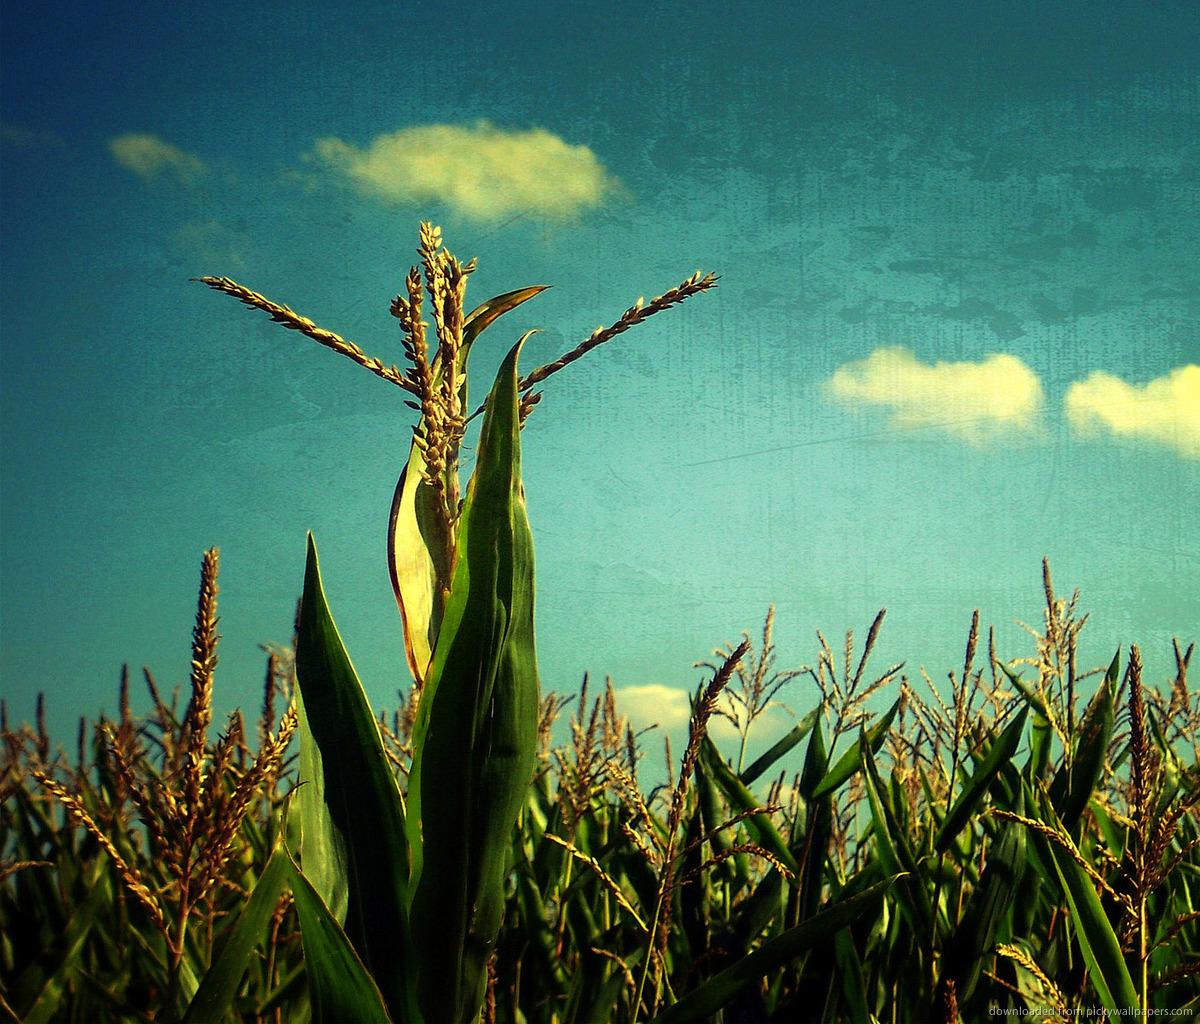 corn fieldjpg 1200x1024